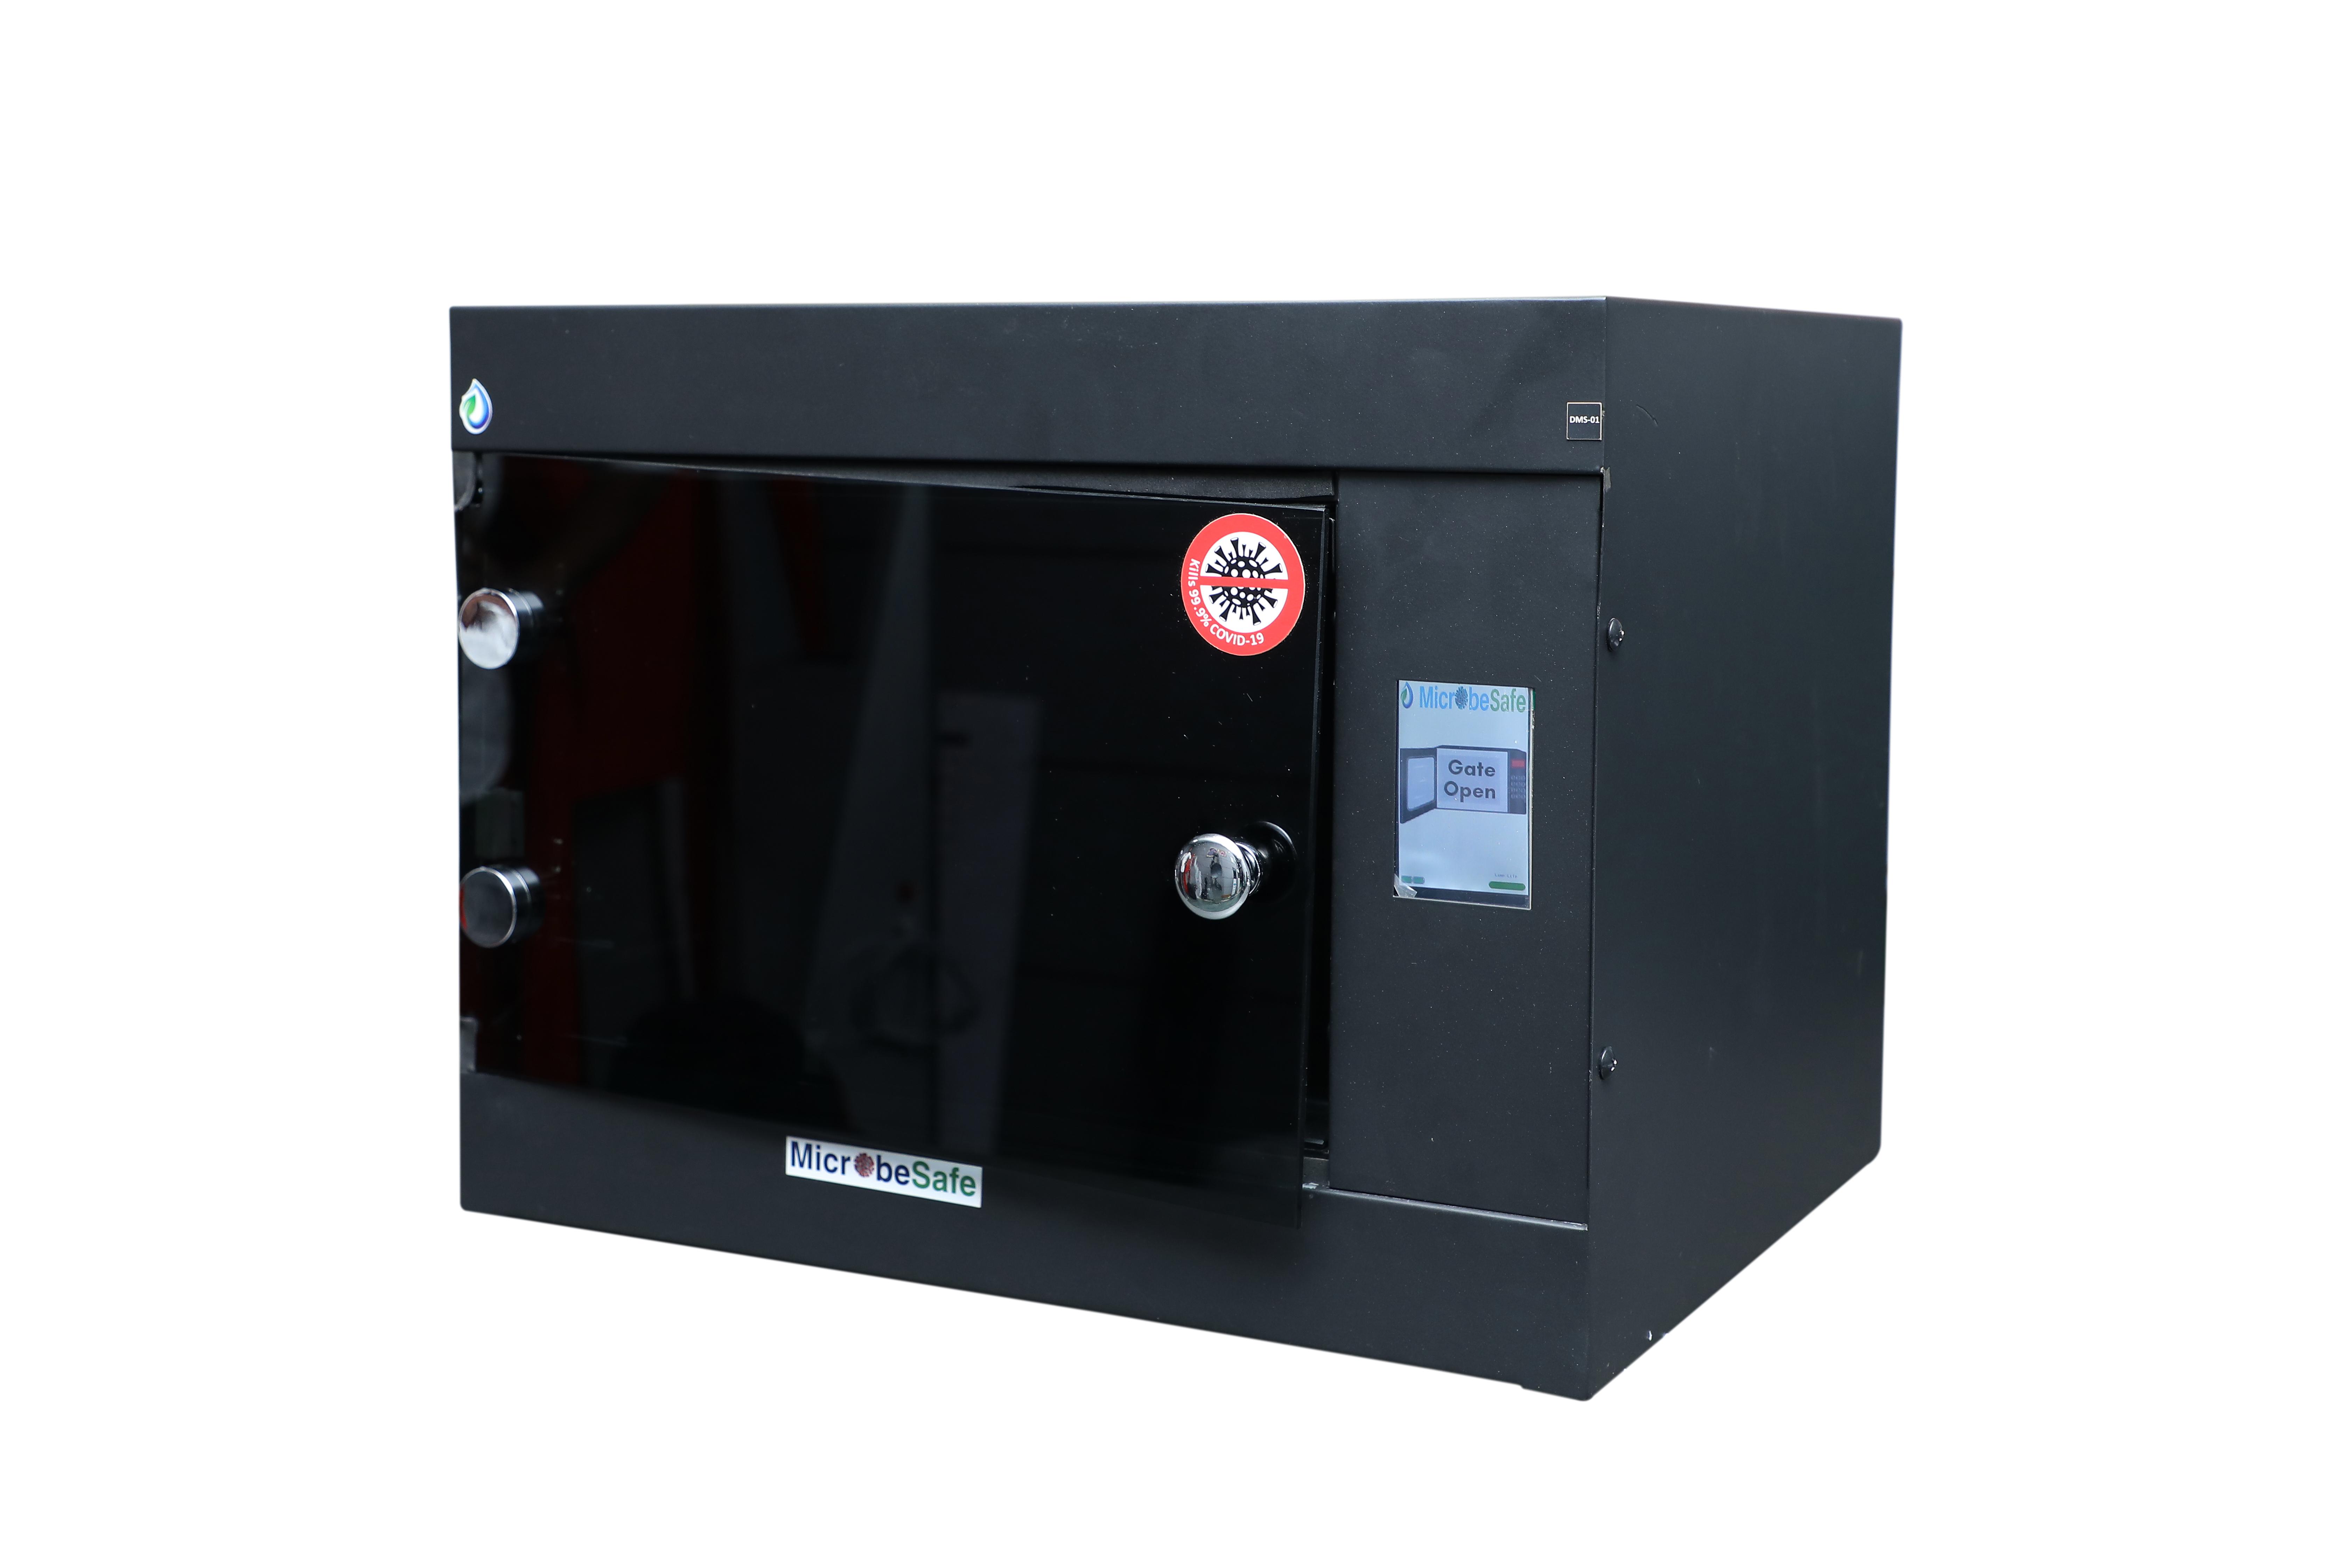 UV Sterilization Microbe-safe MS Powder Coated